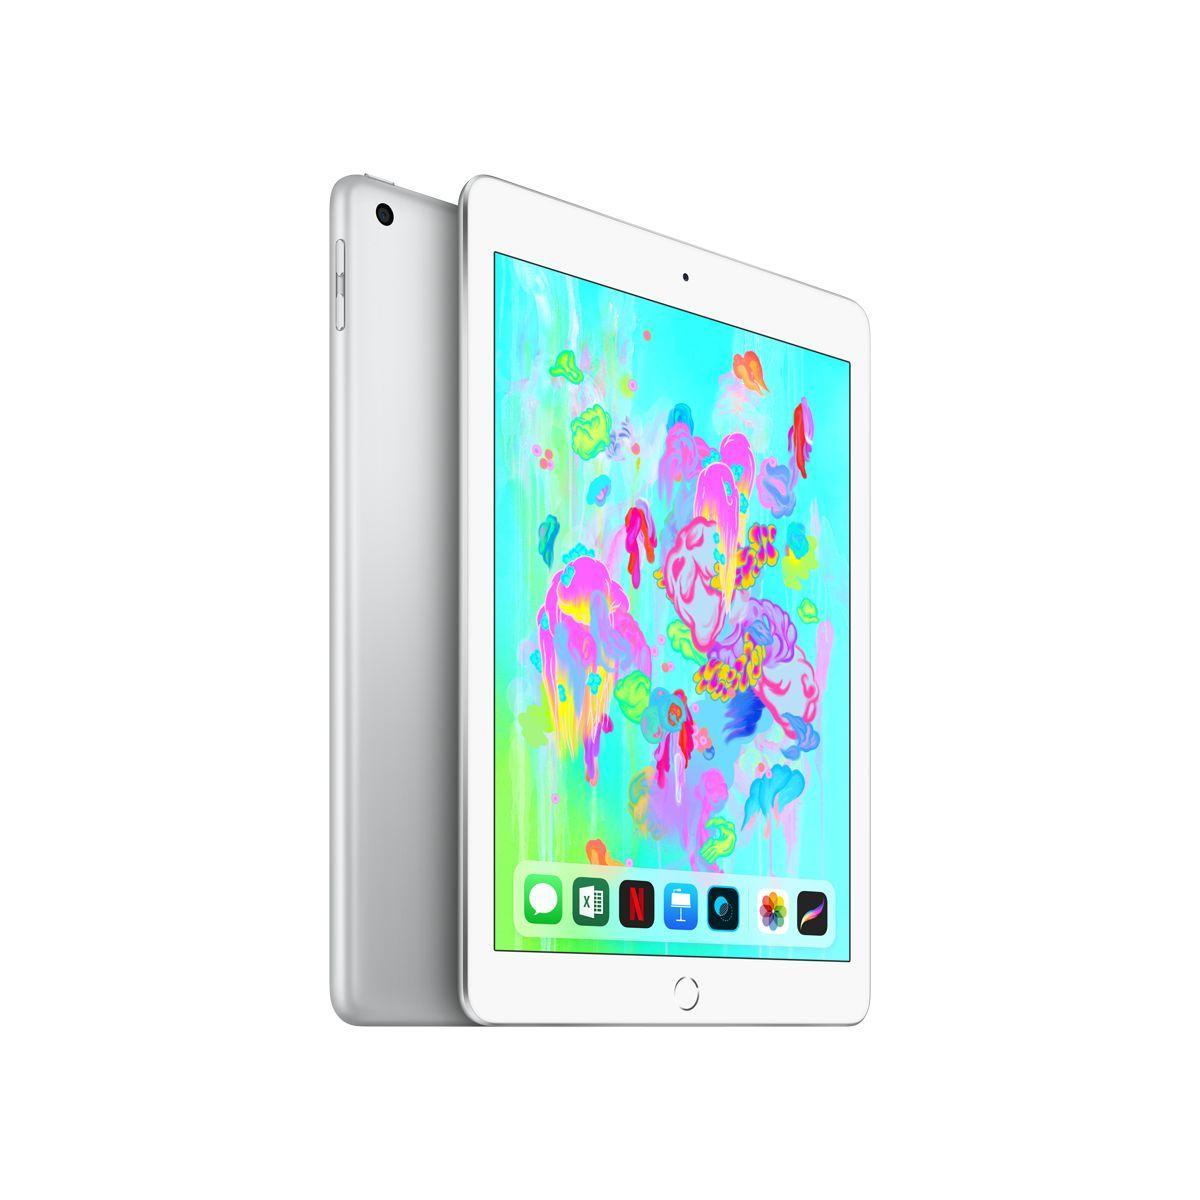 Tablette apple ipad new 32go argent (photo)